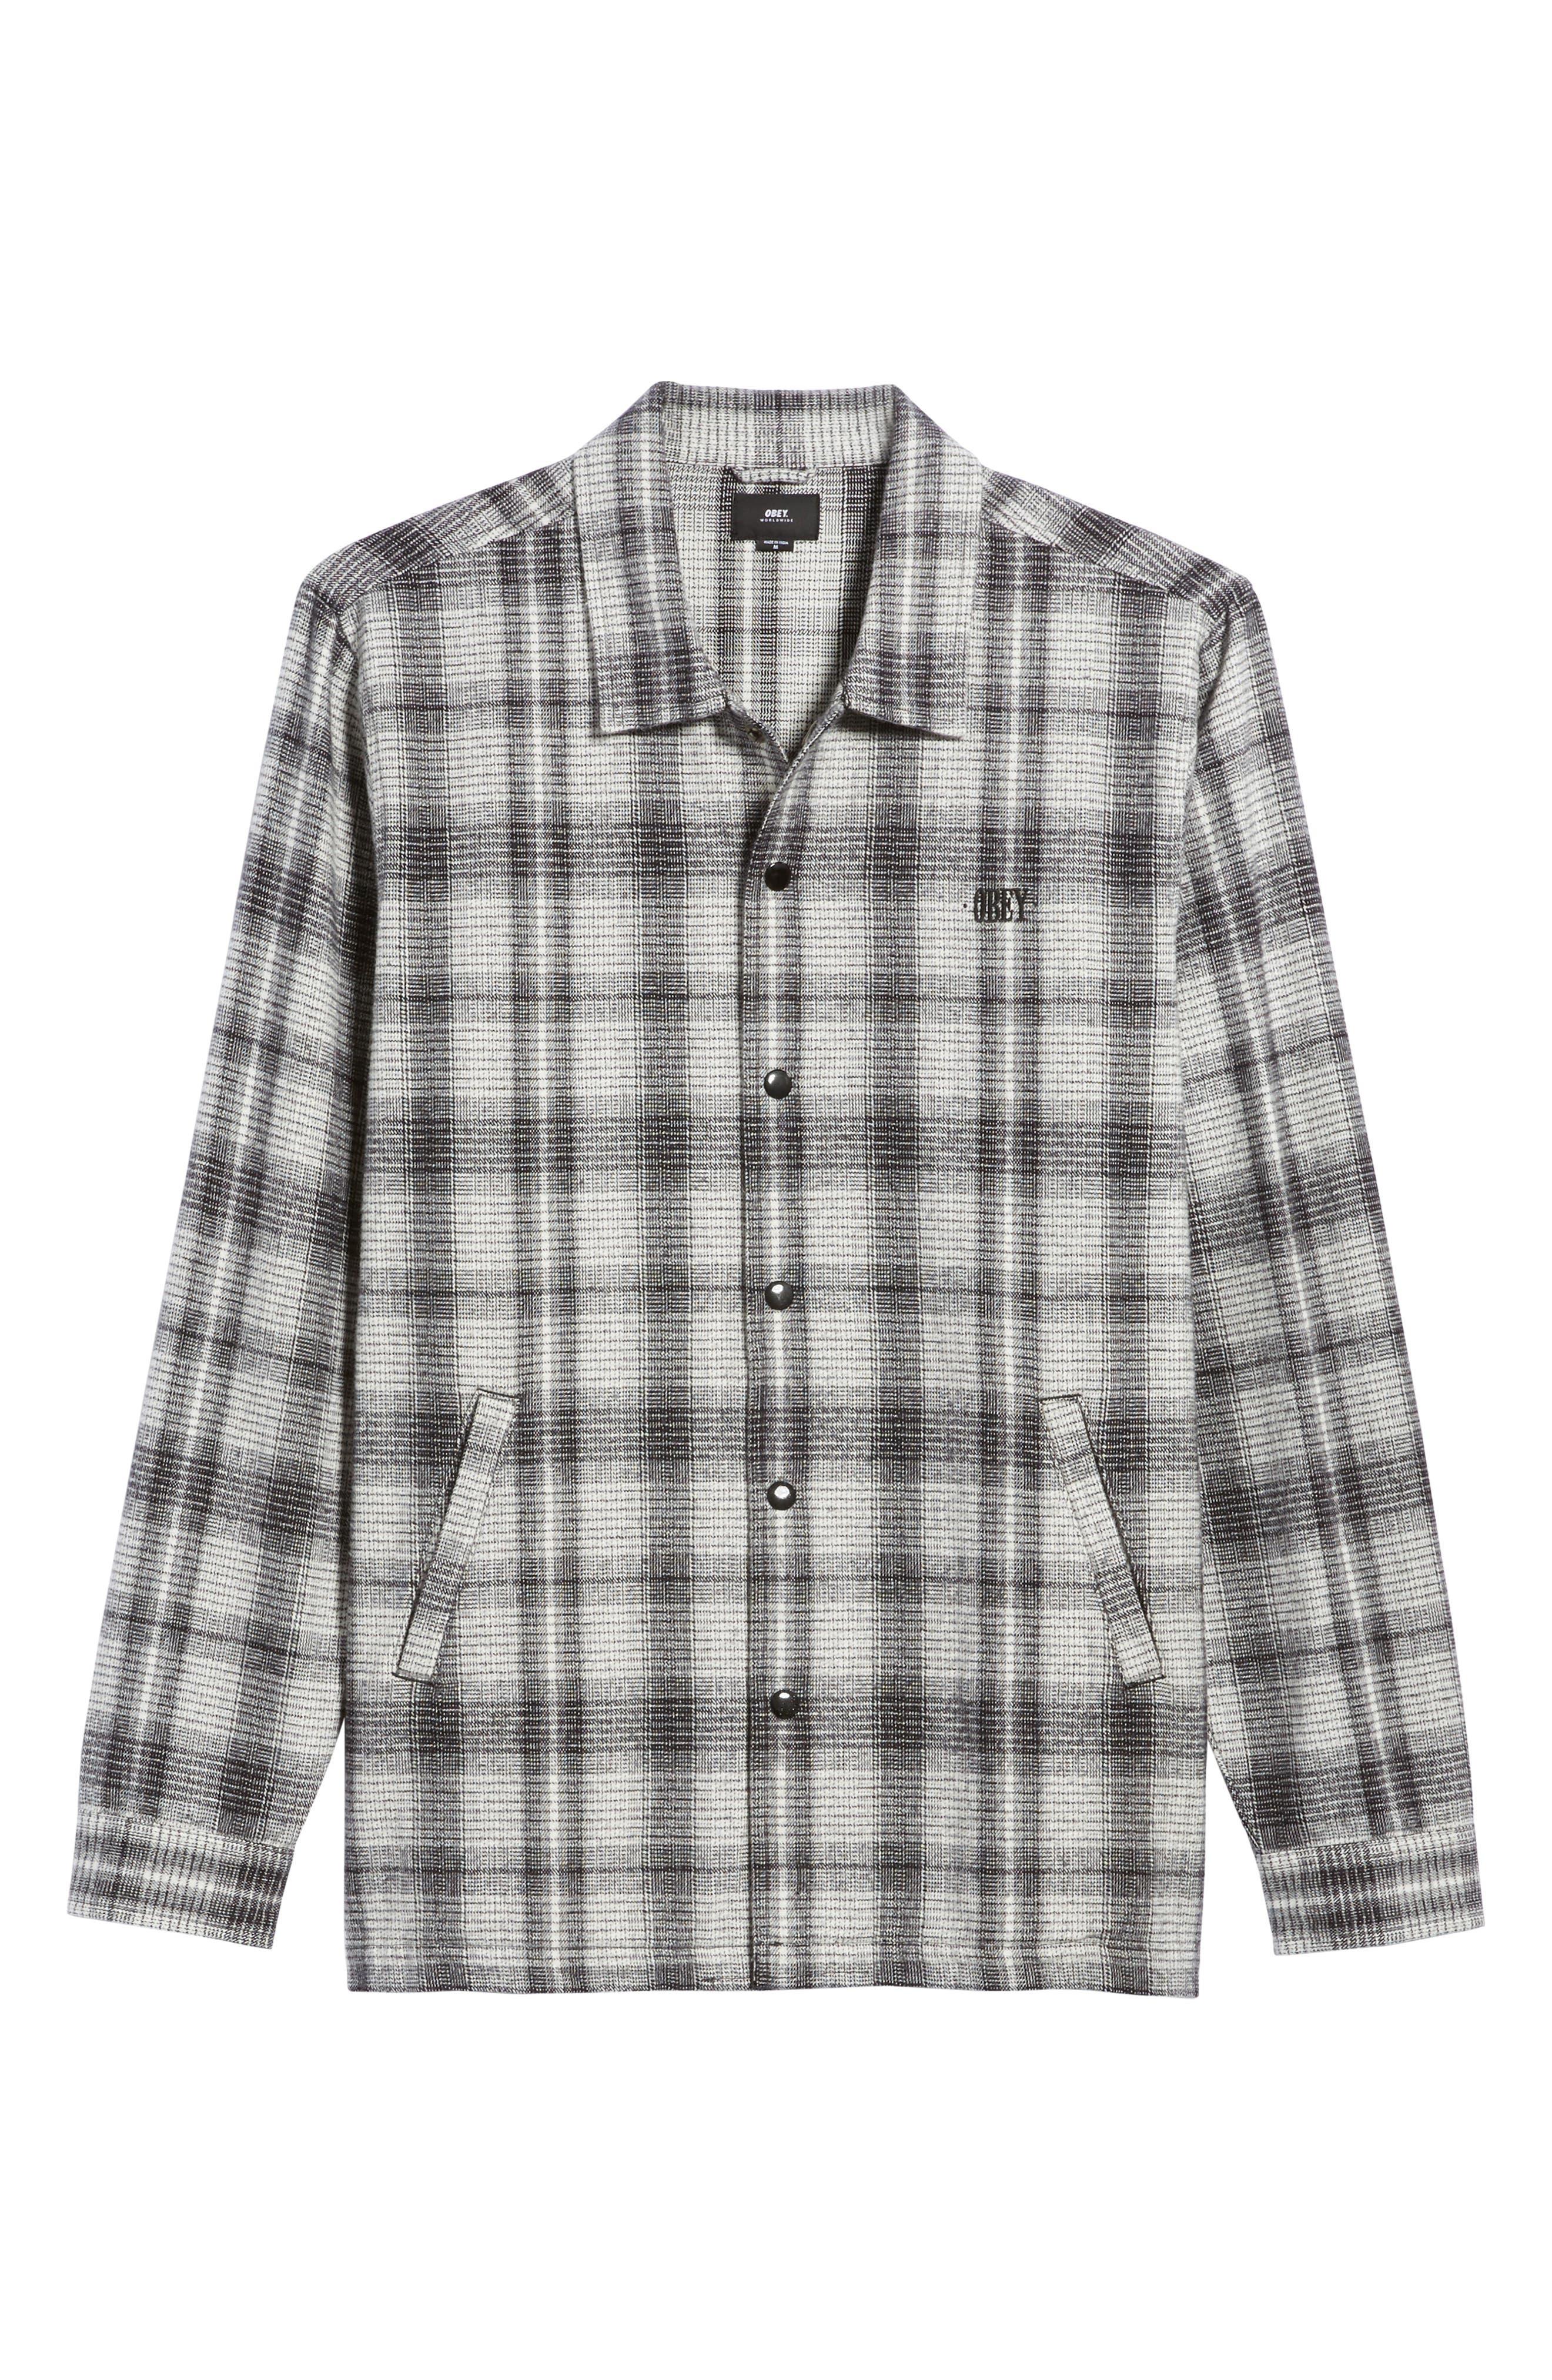 Whittier Plaid Flannel Shirt Jacket,                             Alternate thumbnail 6, color,                             Neutral Grey Multi